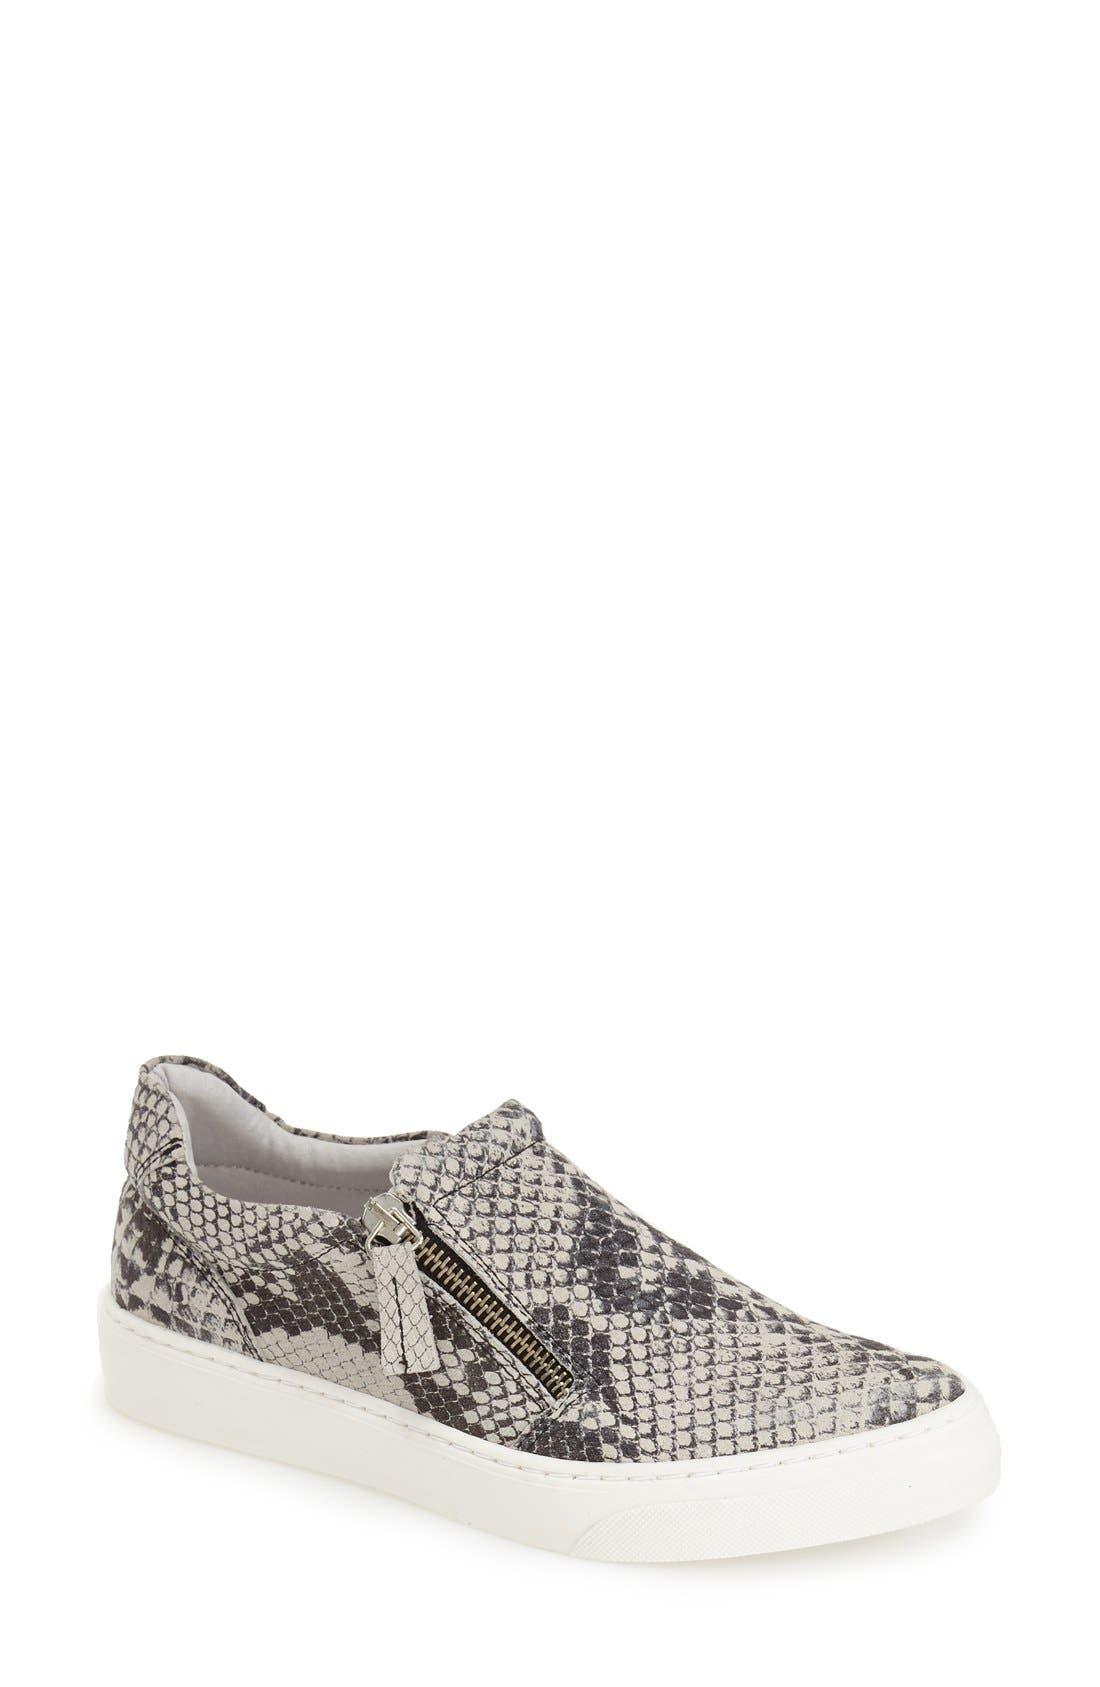 JSLIDES Presto' Slip On Sneaker (Women)